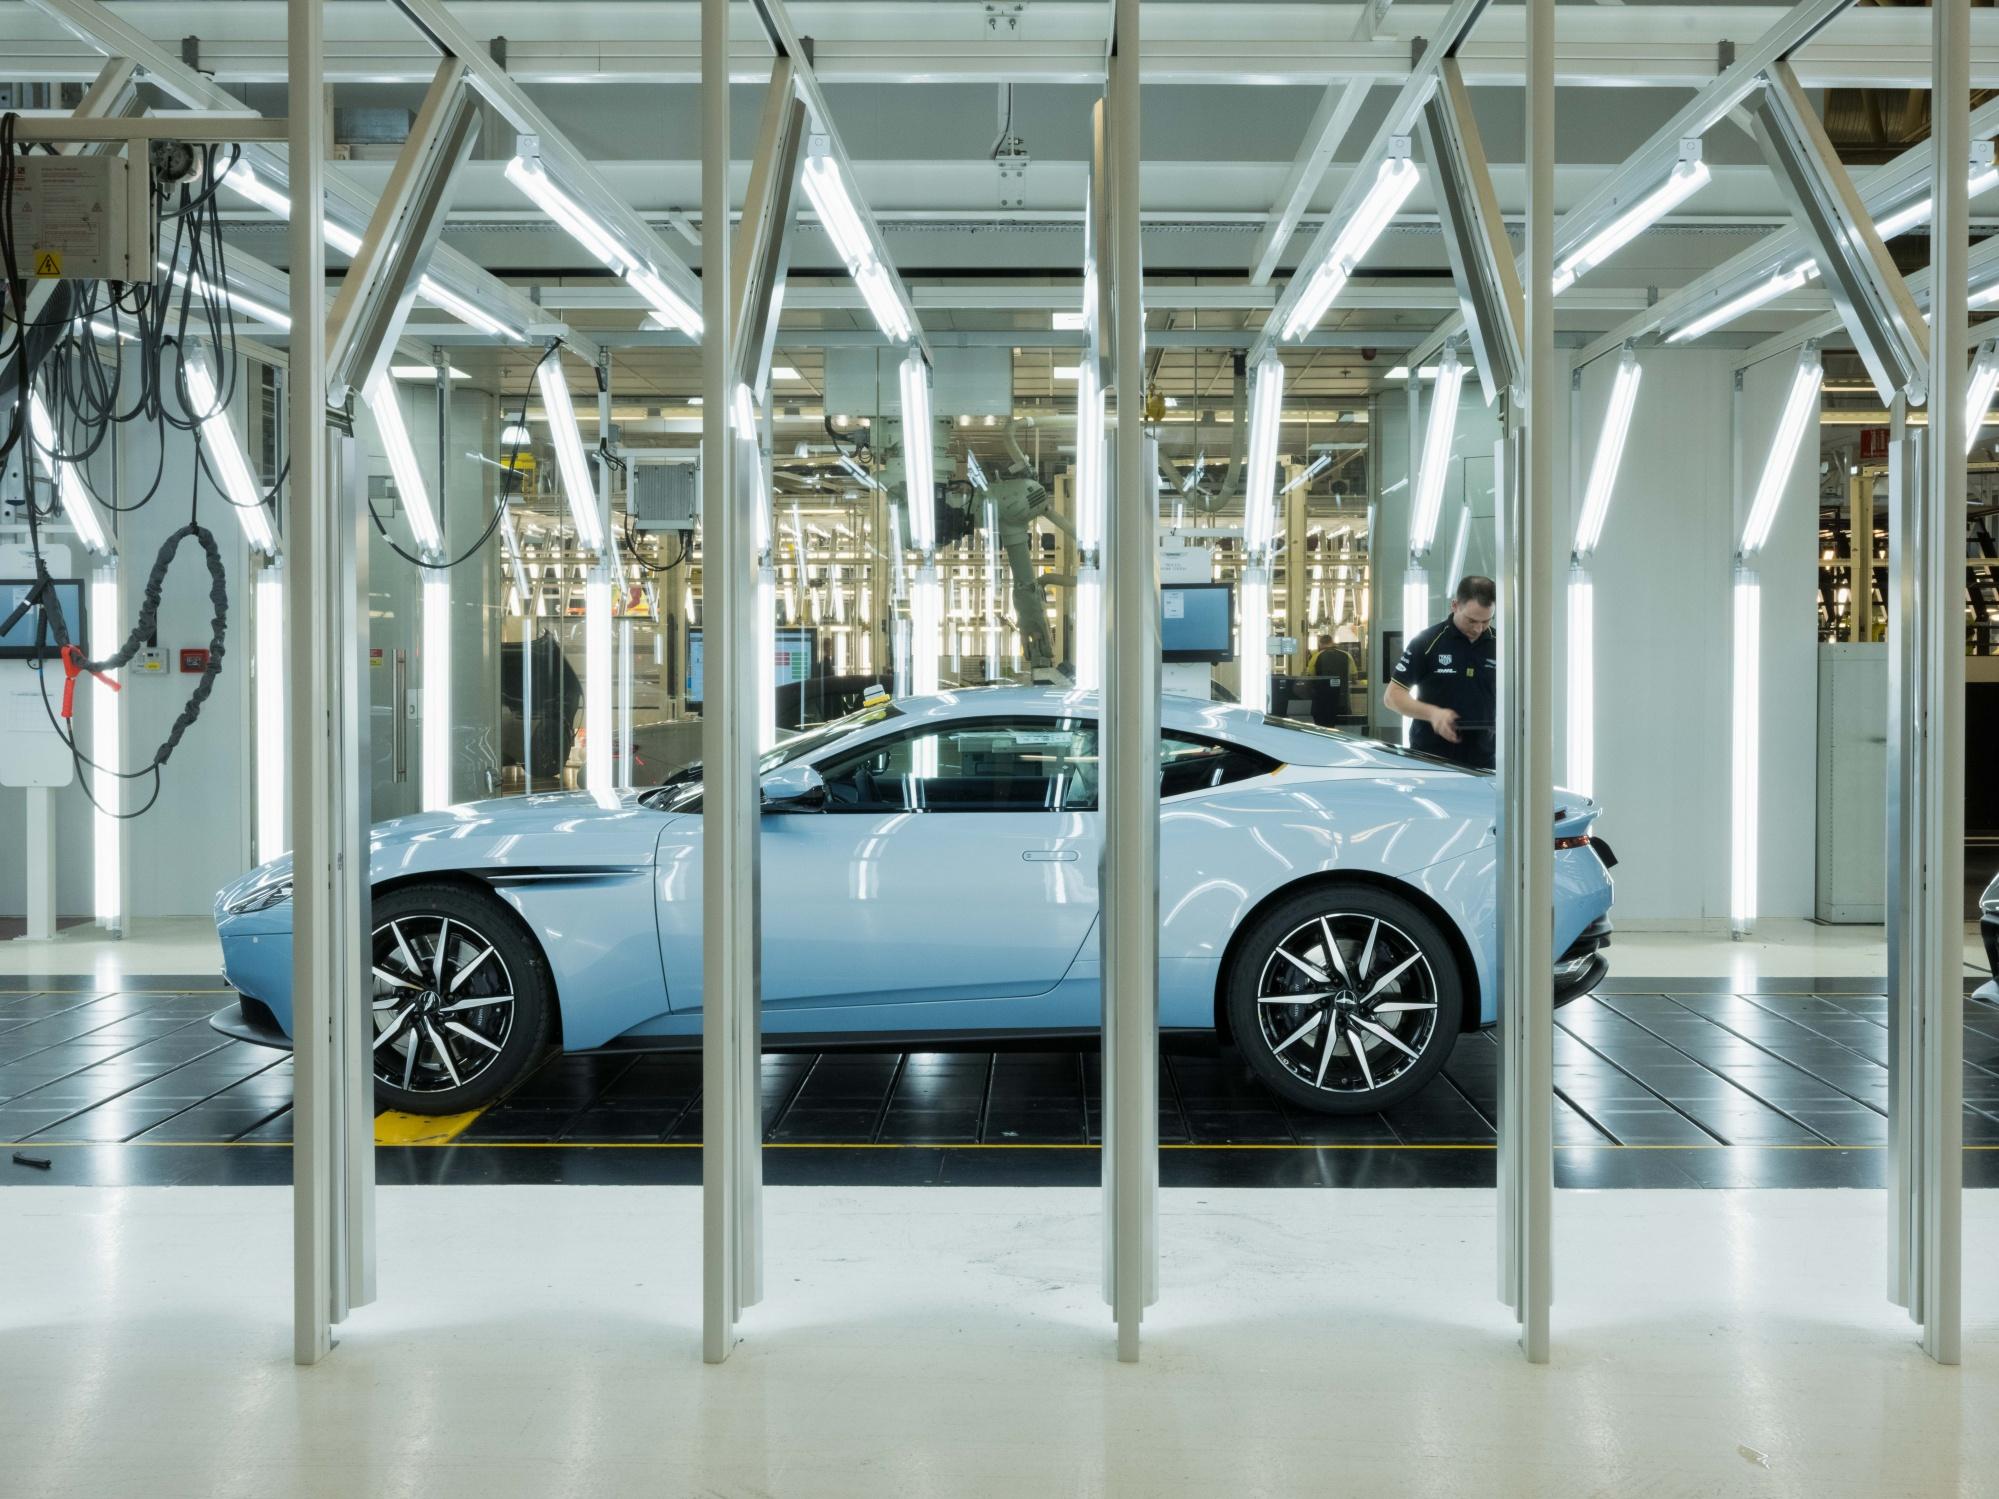 Aston Martin Can Billionaire Lawrence Stroll Save British Icon Bloomberg